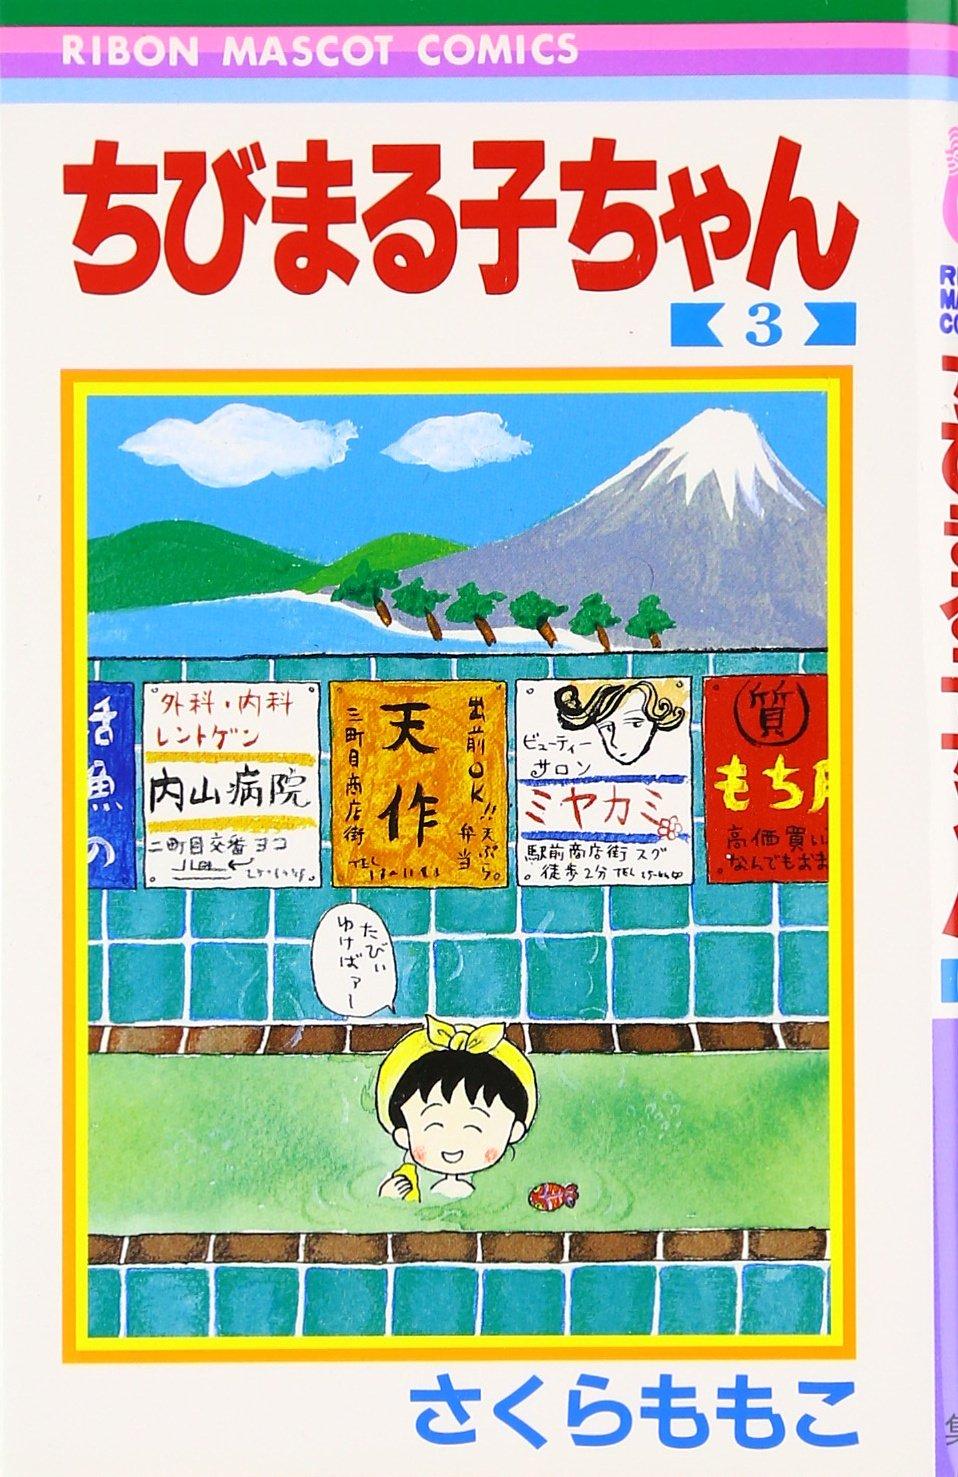 Chibi Maruko-chan Vol. 3 (Manga) [in Japanese Language]